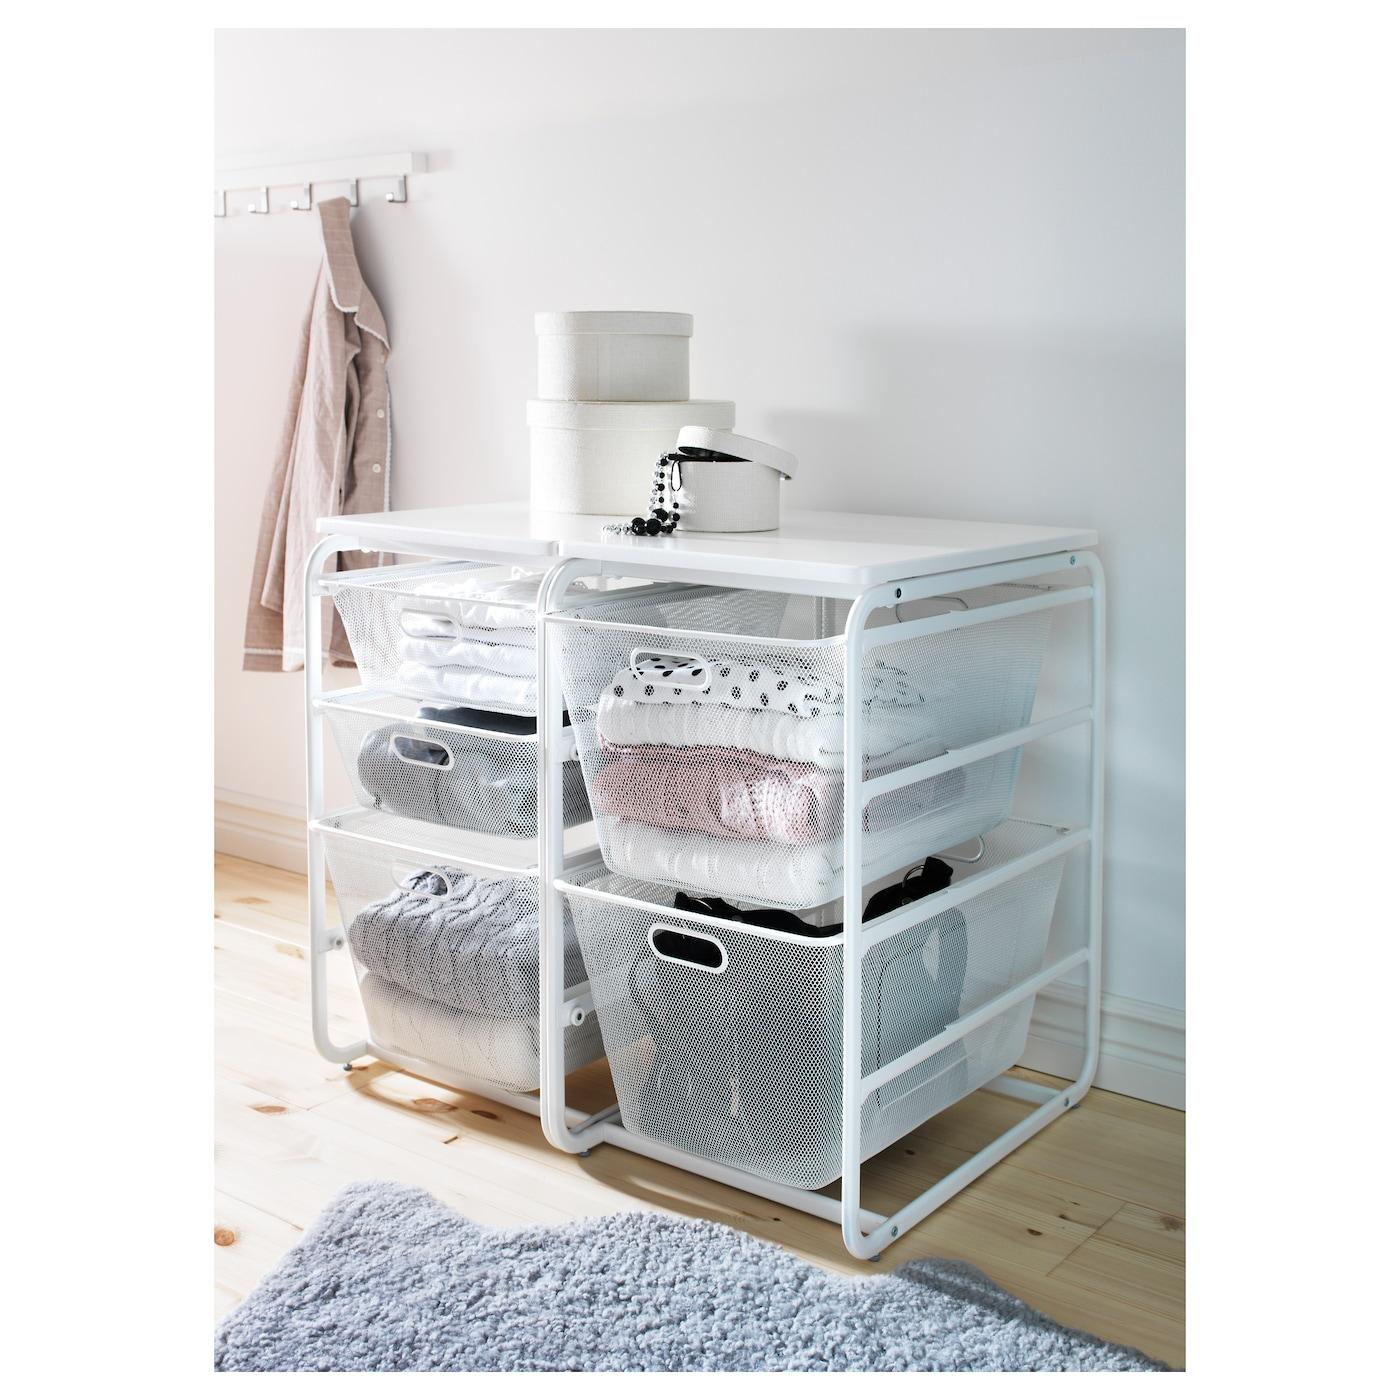 algot structure 2corbeilles filet tab sup blanc 41x60x75 cm ikea. Black Bedroom Furniture Sets. Home Design Ideas